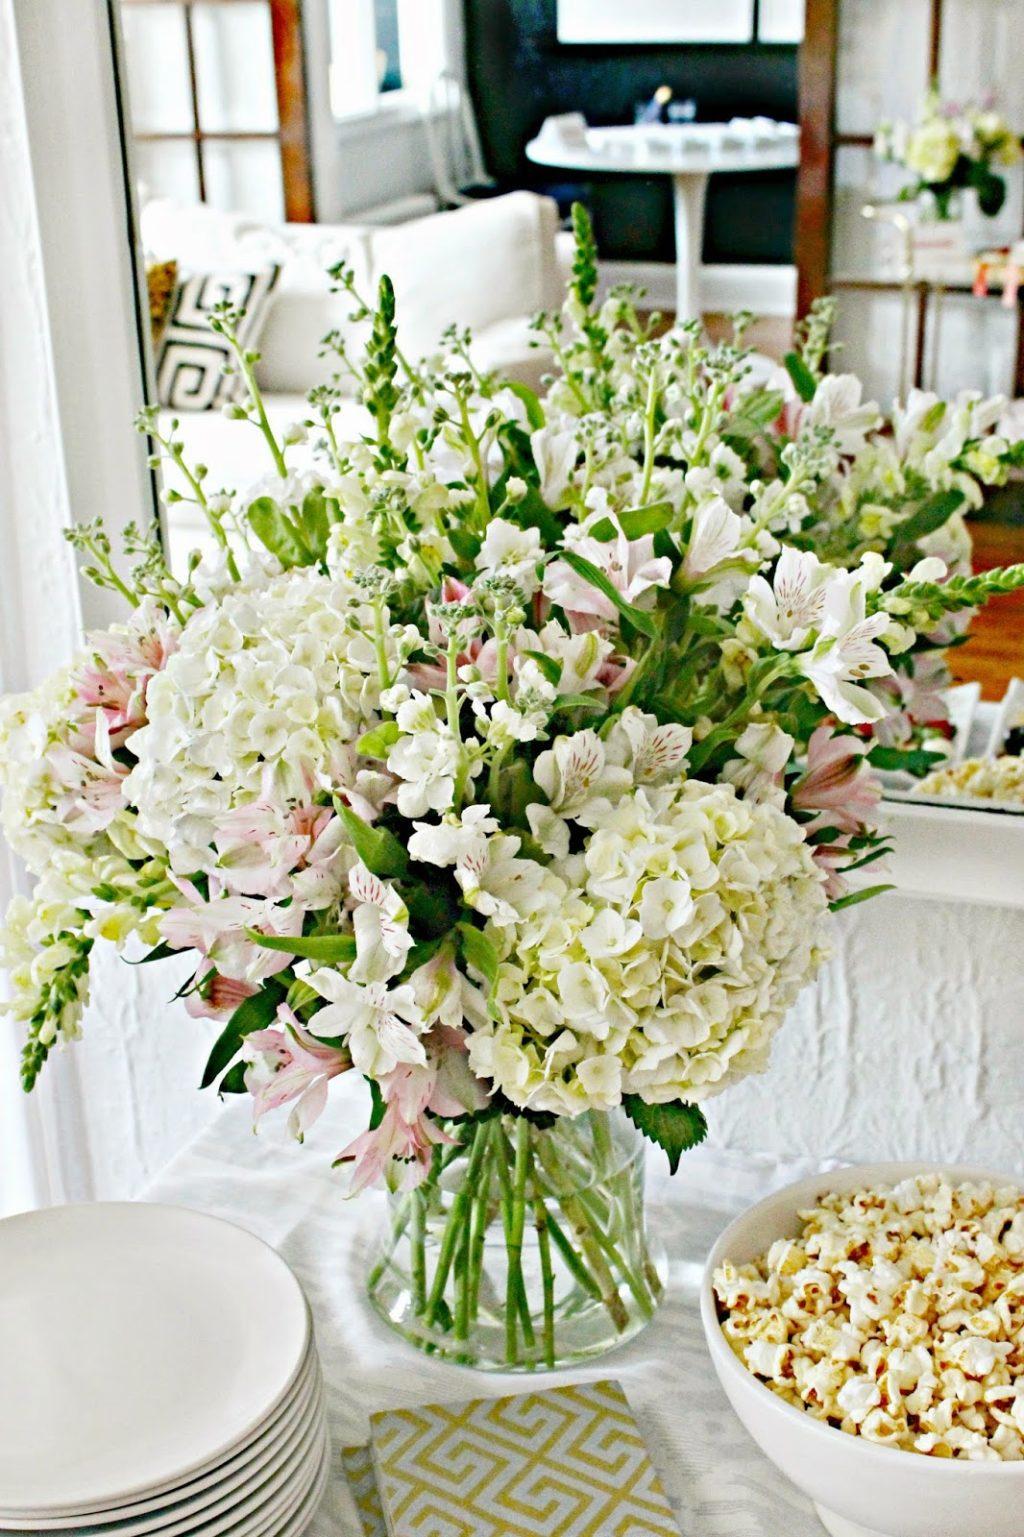 Breathtaking Floral - Summer Adams